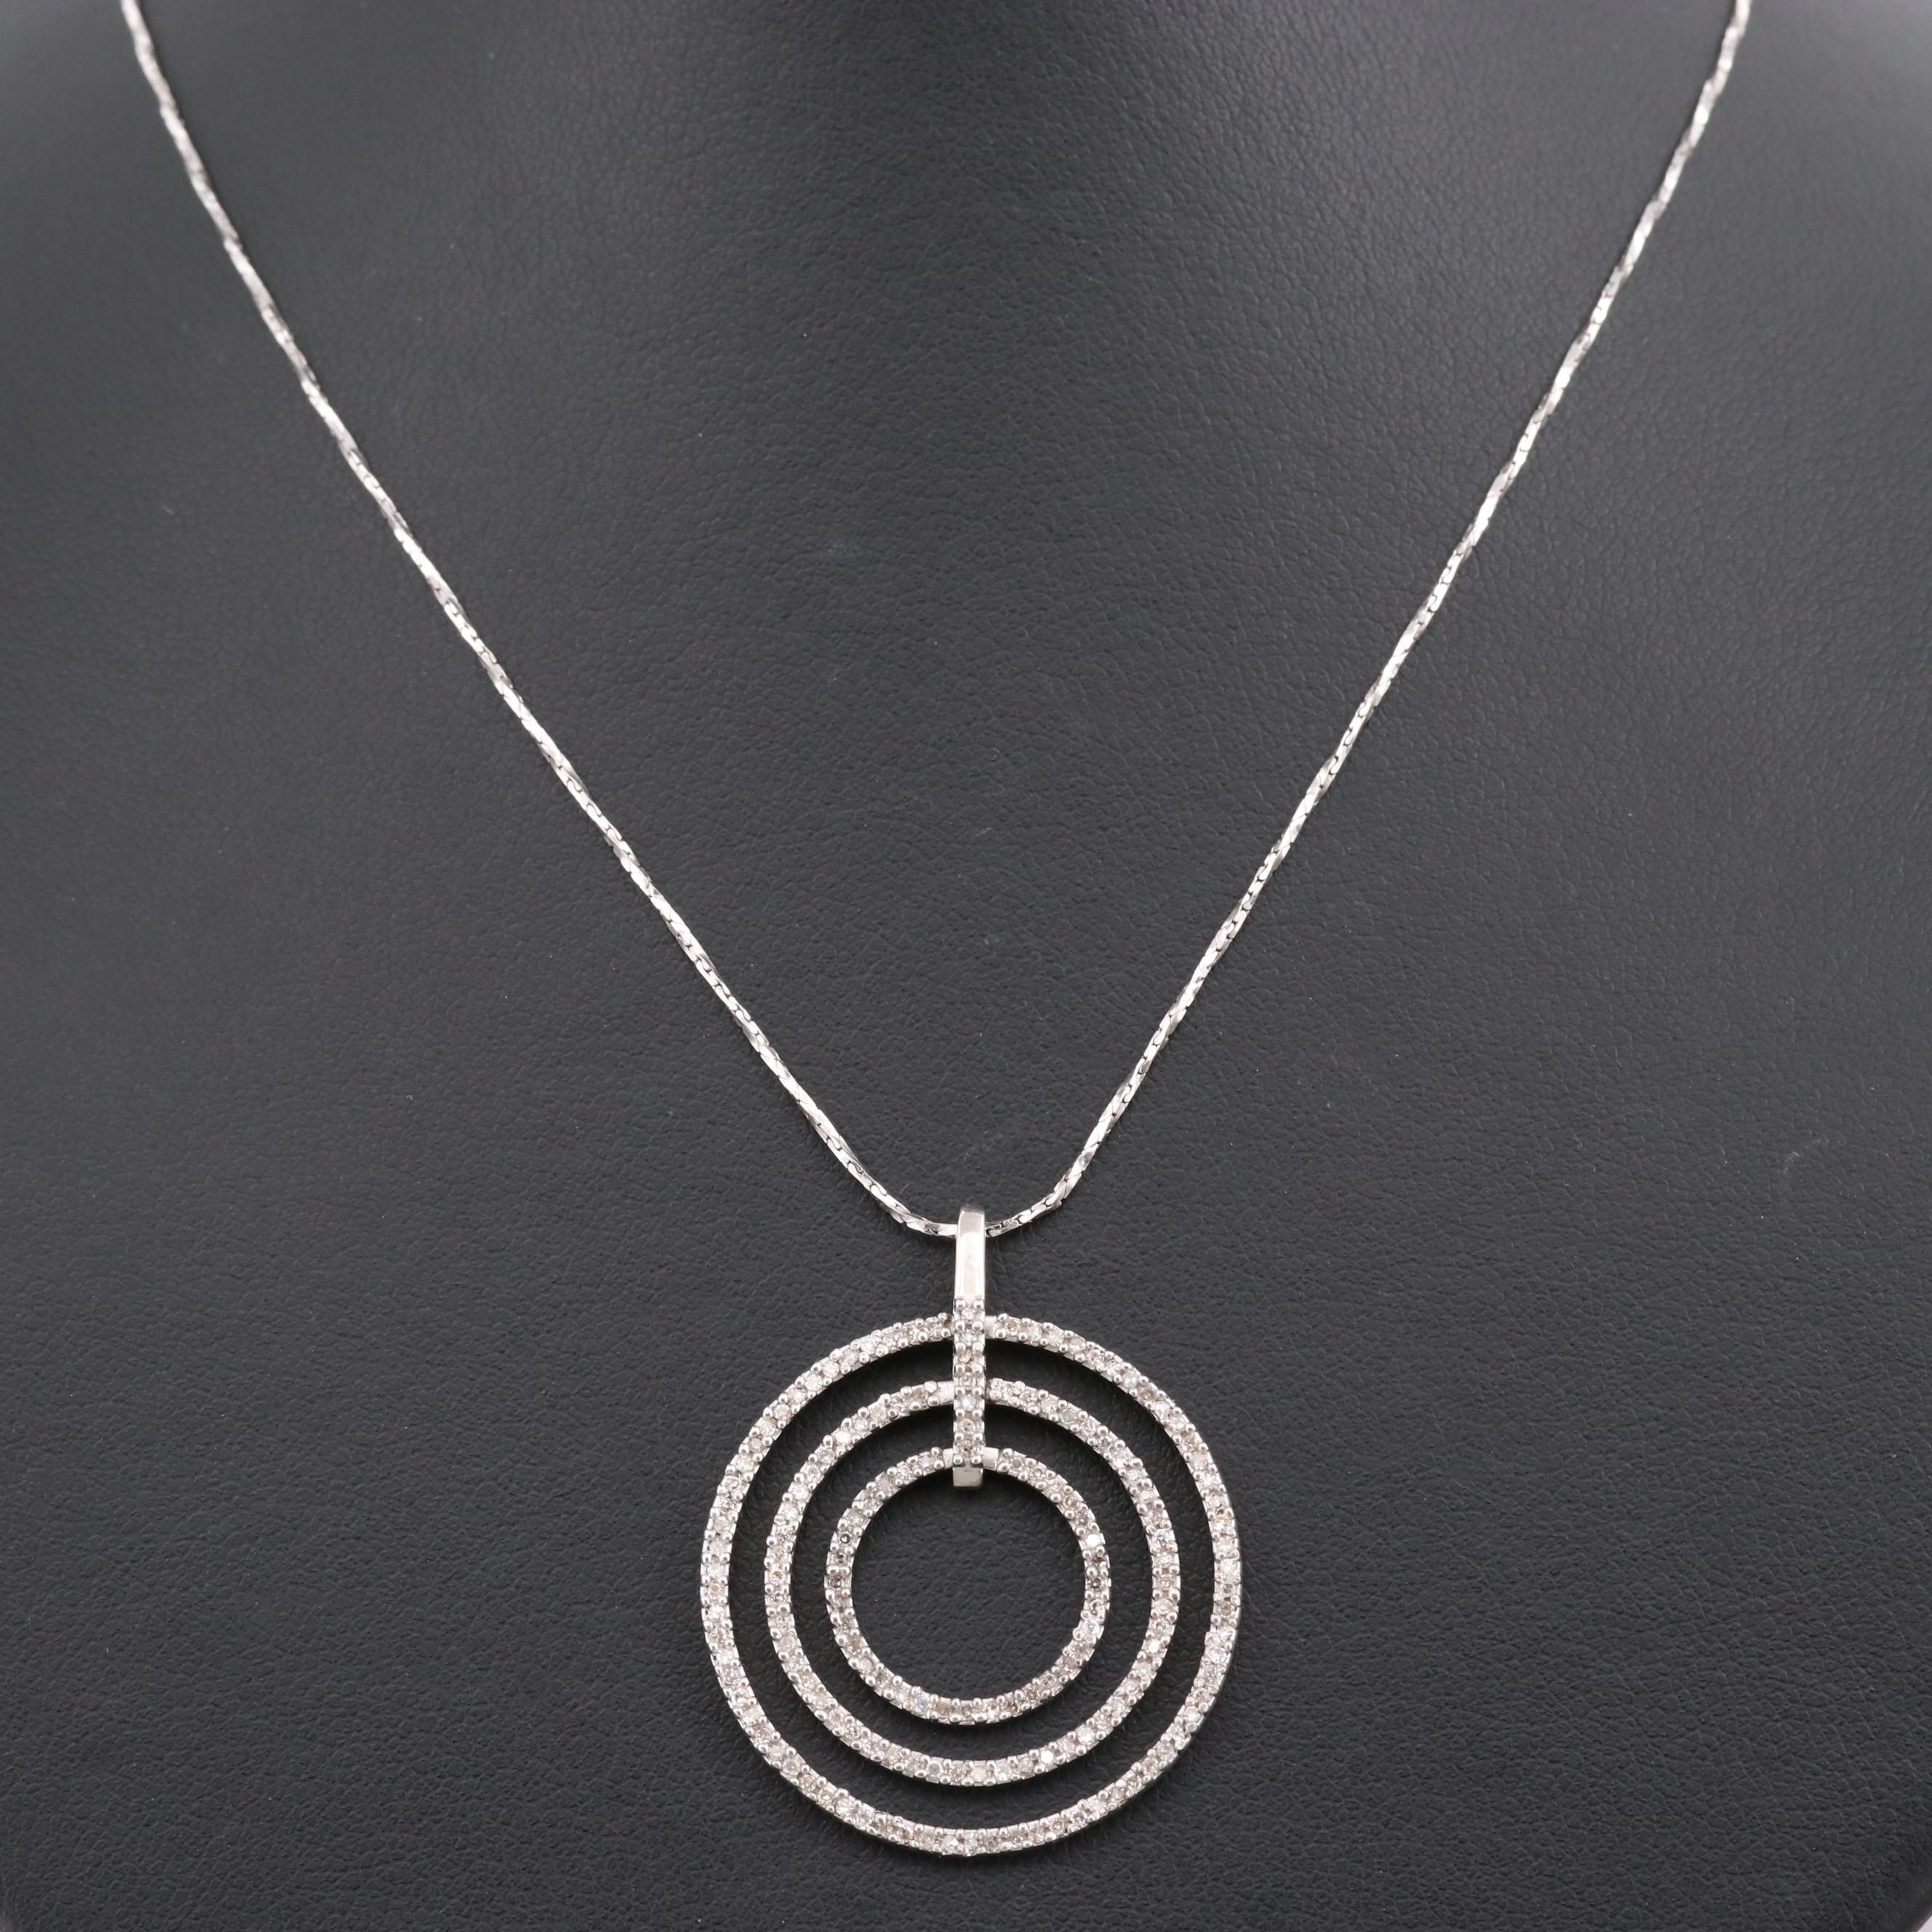 10K White Gold Diamond Triple Circle Pendant with 14K White Gold Chain Necklace